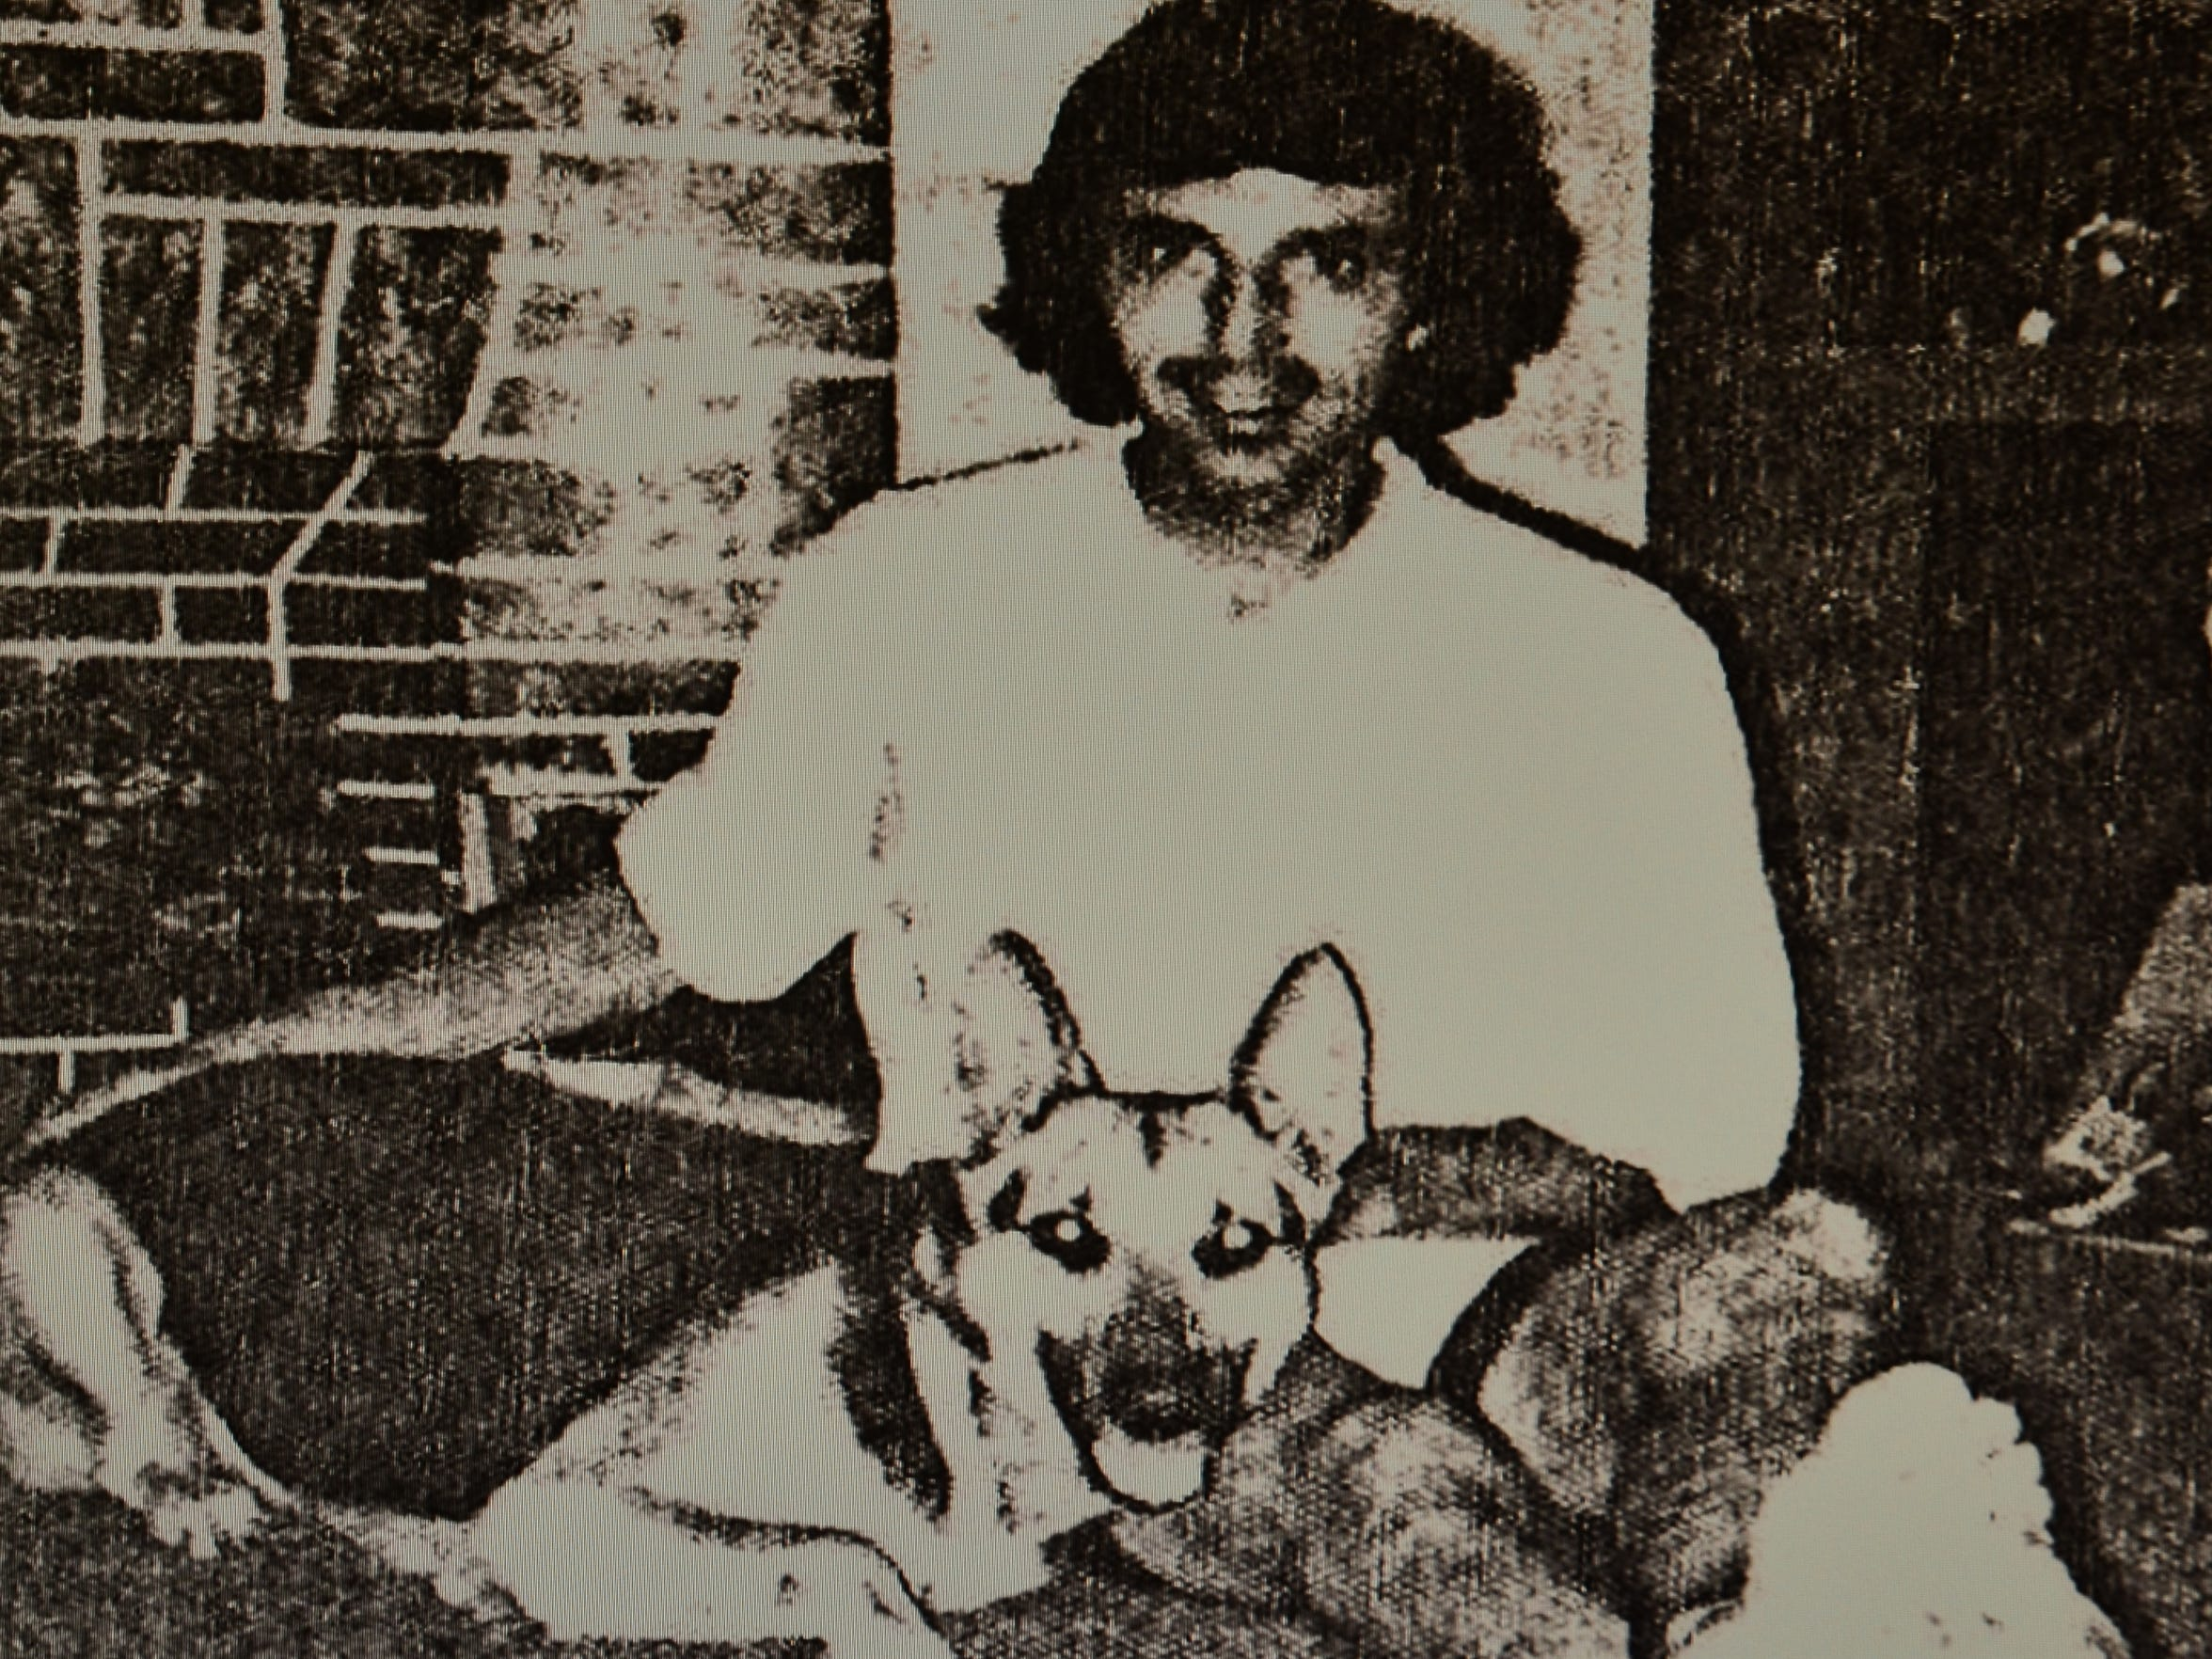 Victim James Dvorak was killed in 1981 in Satellite Beach. Copy work for the William Dillon case  photo of victim James Dvorak